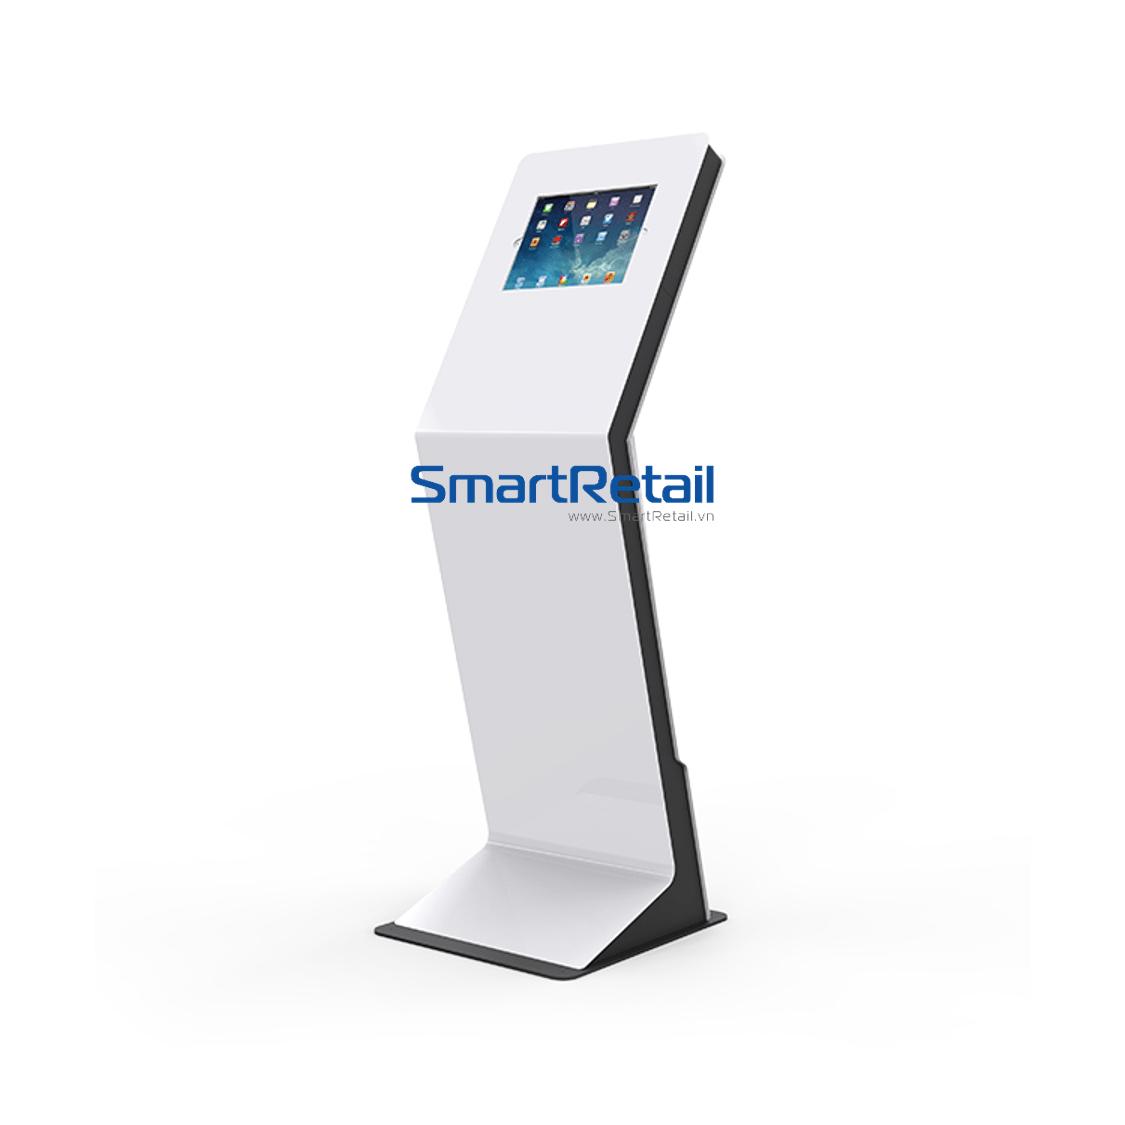 SmartRetail Thiet bi bao ve Tablet SF105 3